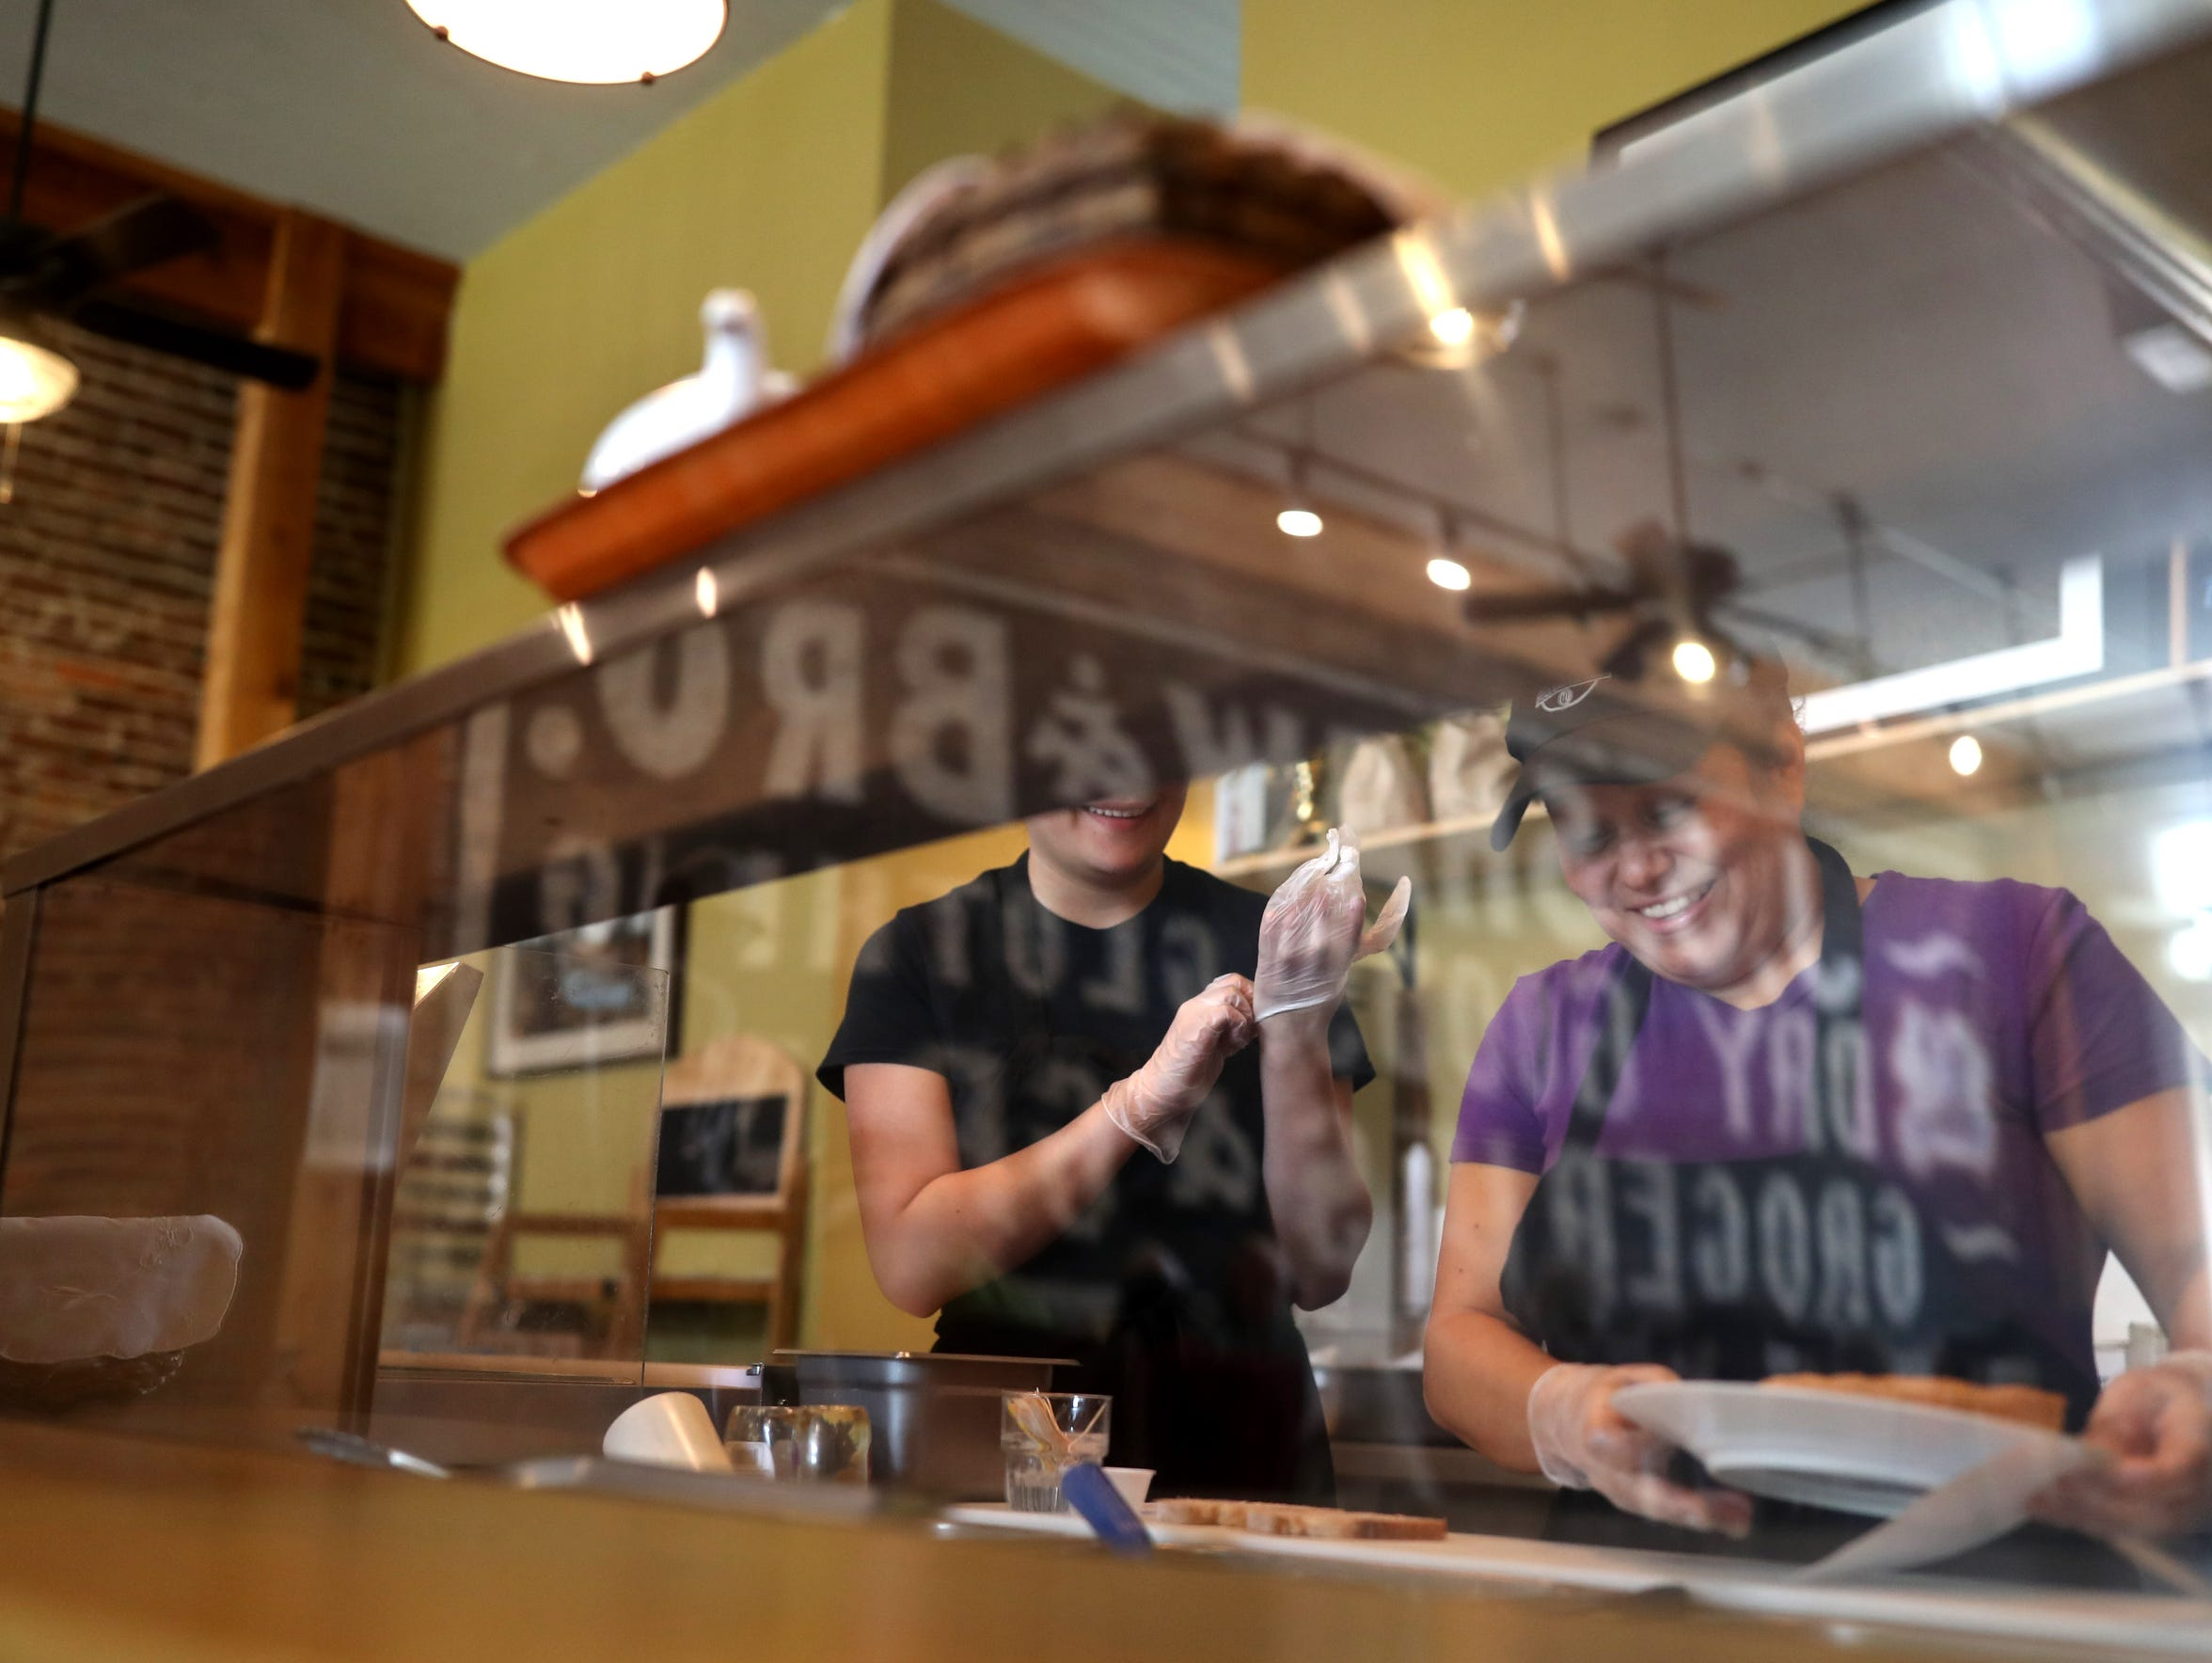 Gladis de la Cruz works at Damfino's Cafe & Market